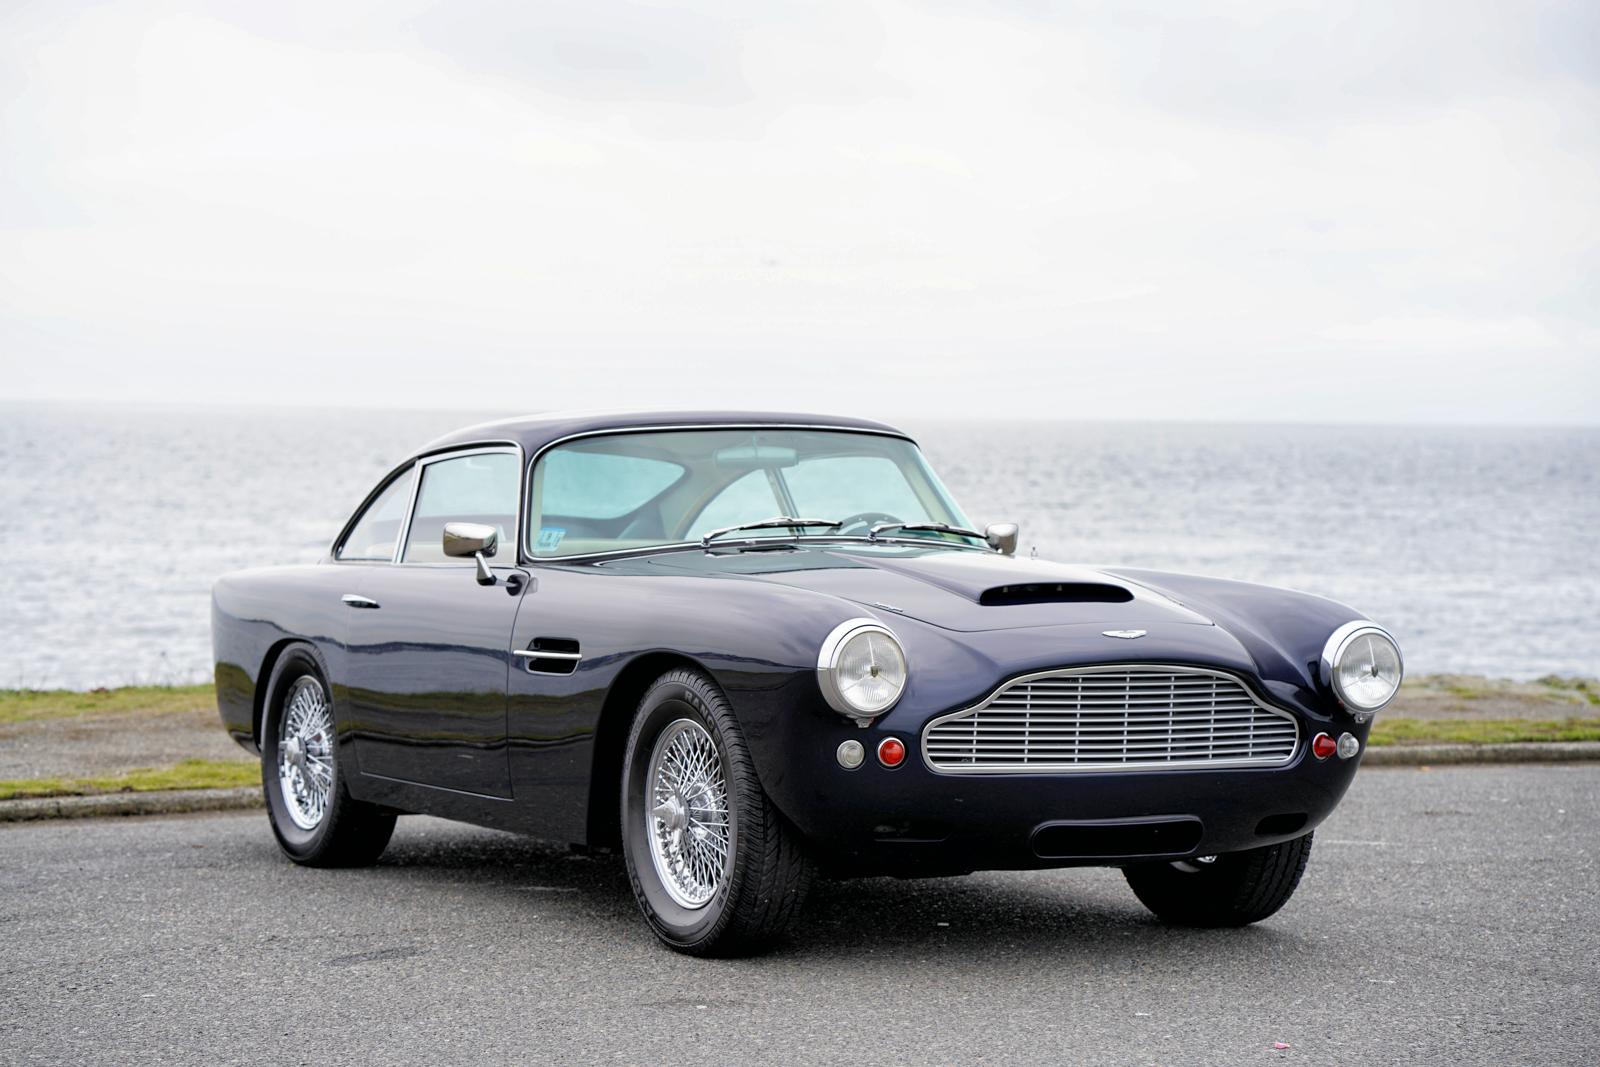 1962 Aston Martin DB4 Series IV - Silver Arrow Cars Ltd.